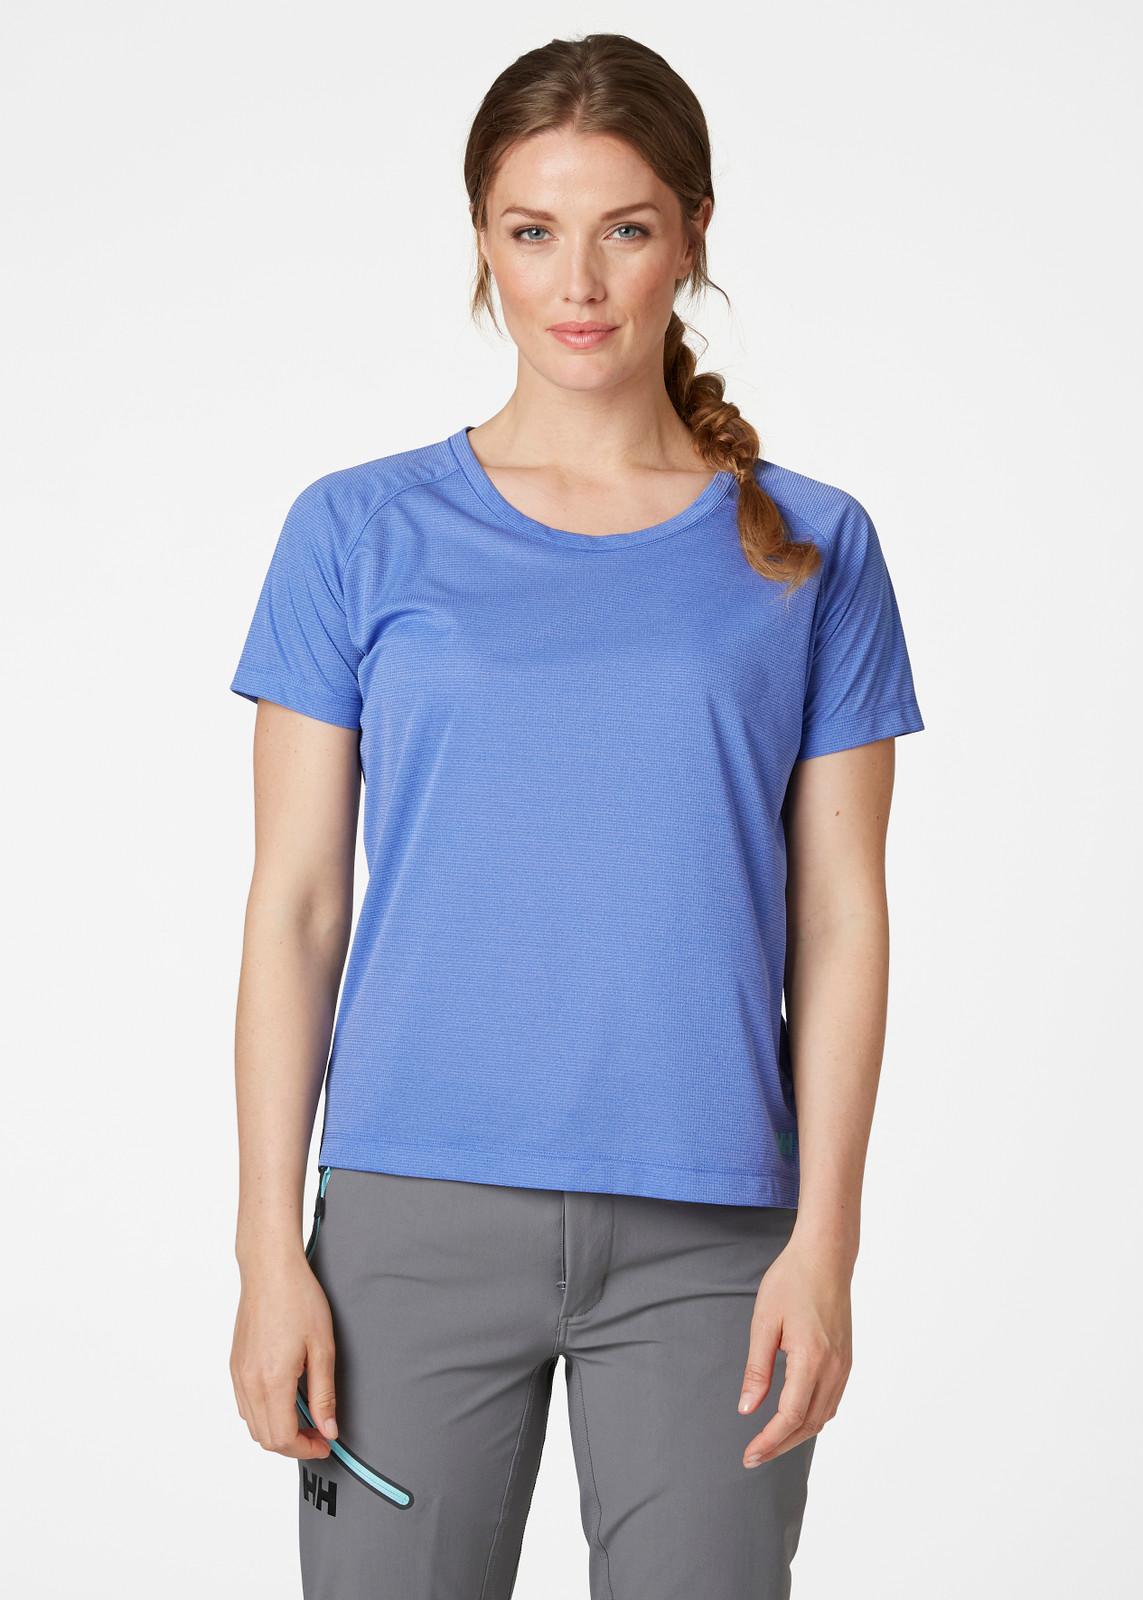 Helly Hansen Verglas Pace T-Shirt, Women's - Royal Blue, 62967-514 on model